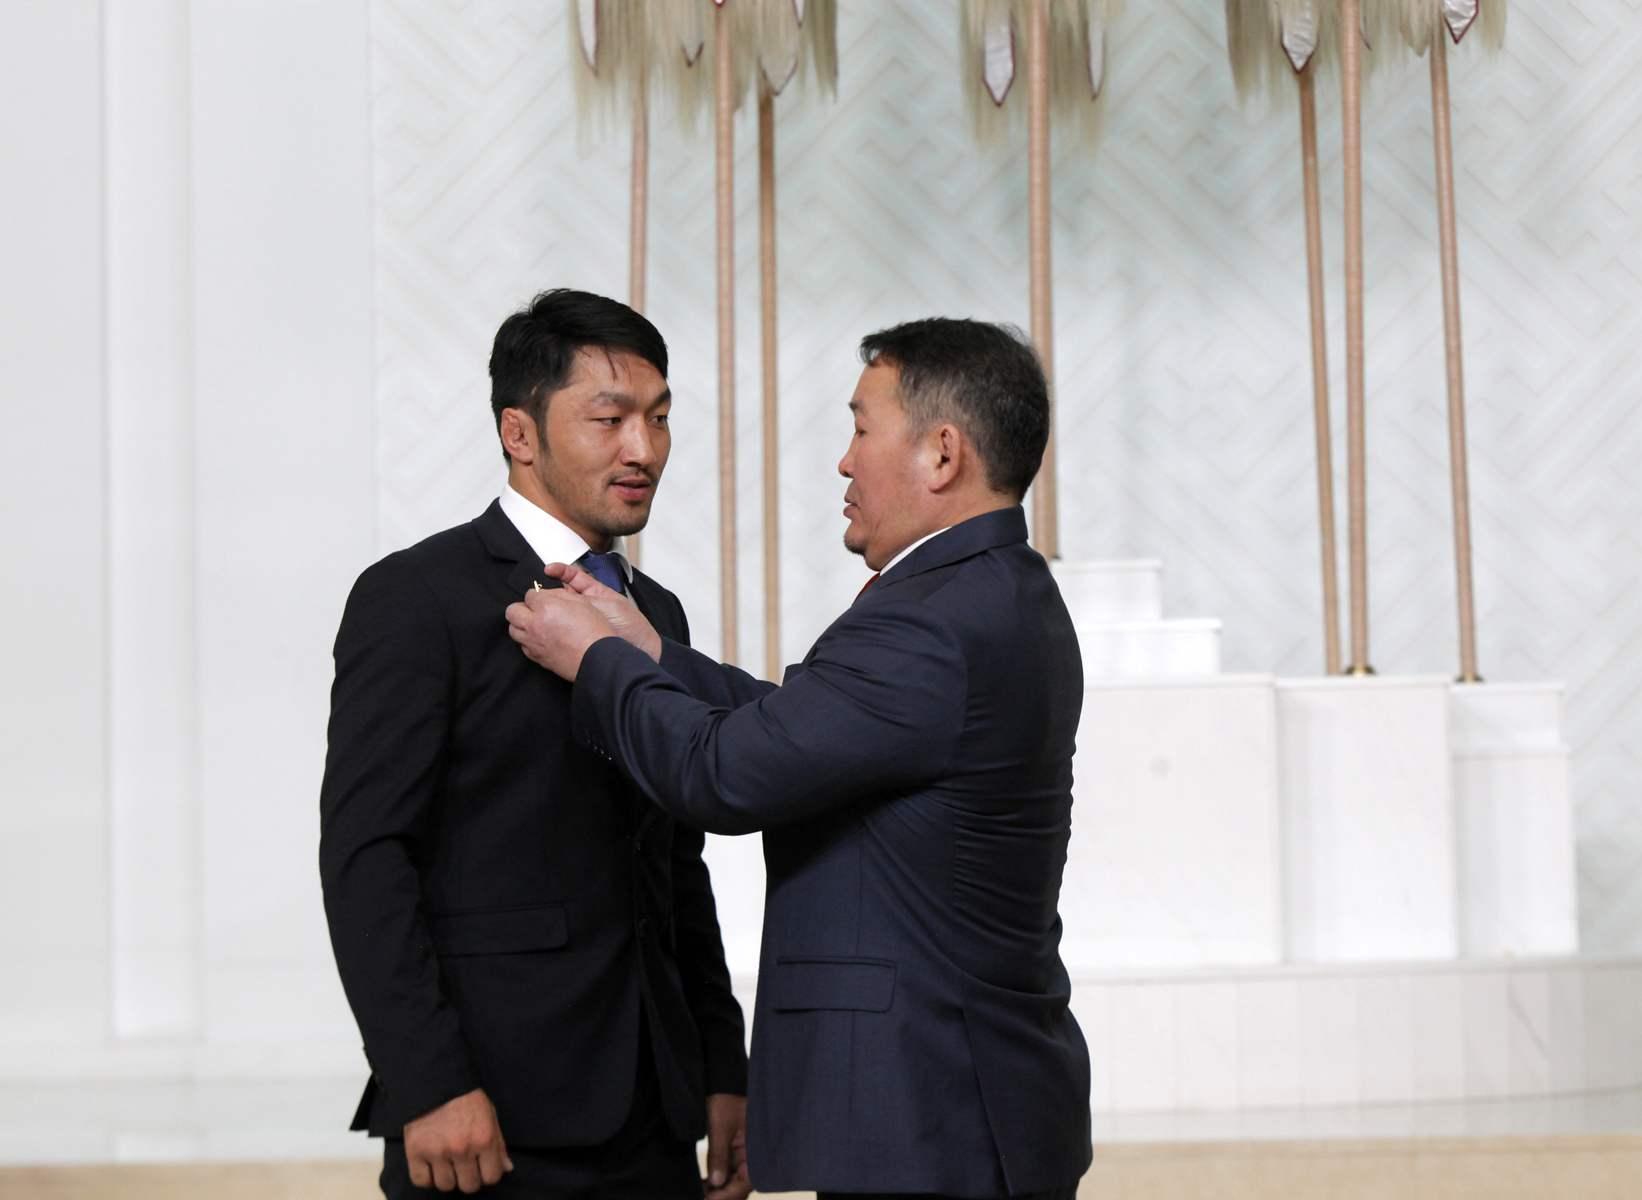 Монгол Улсын гавьяат тамирчин Г.Одбаяр